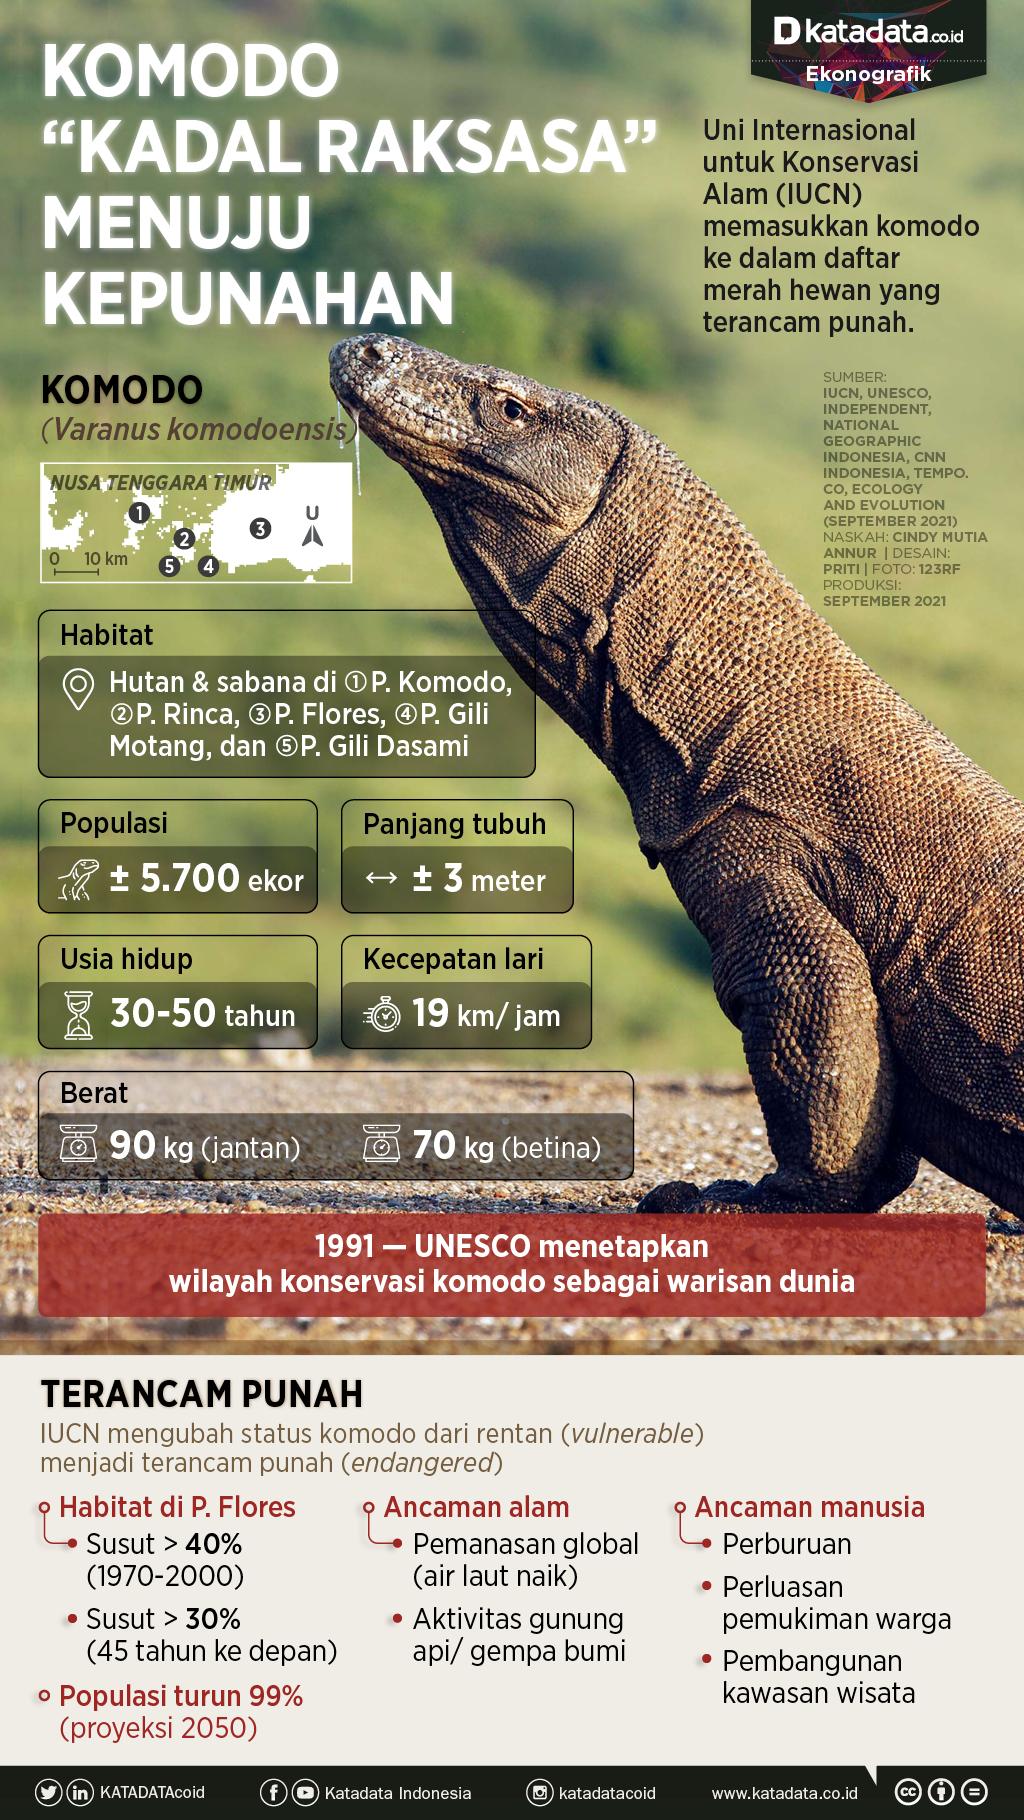 Infografik_Komodo kadal raksasa menuju kepunahan